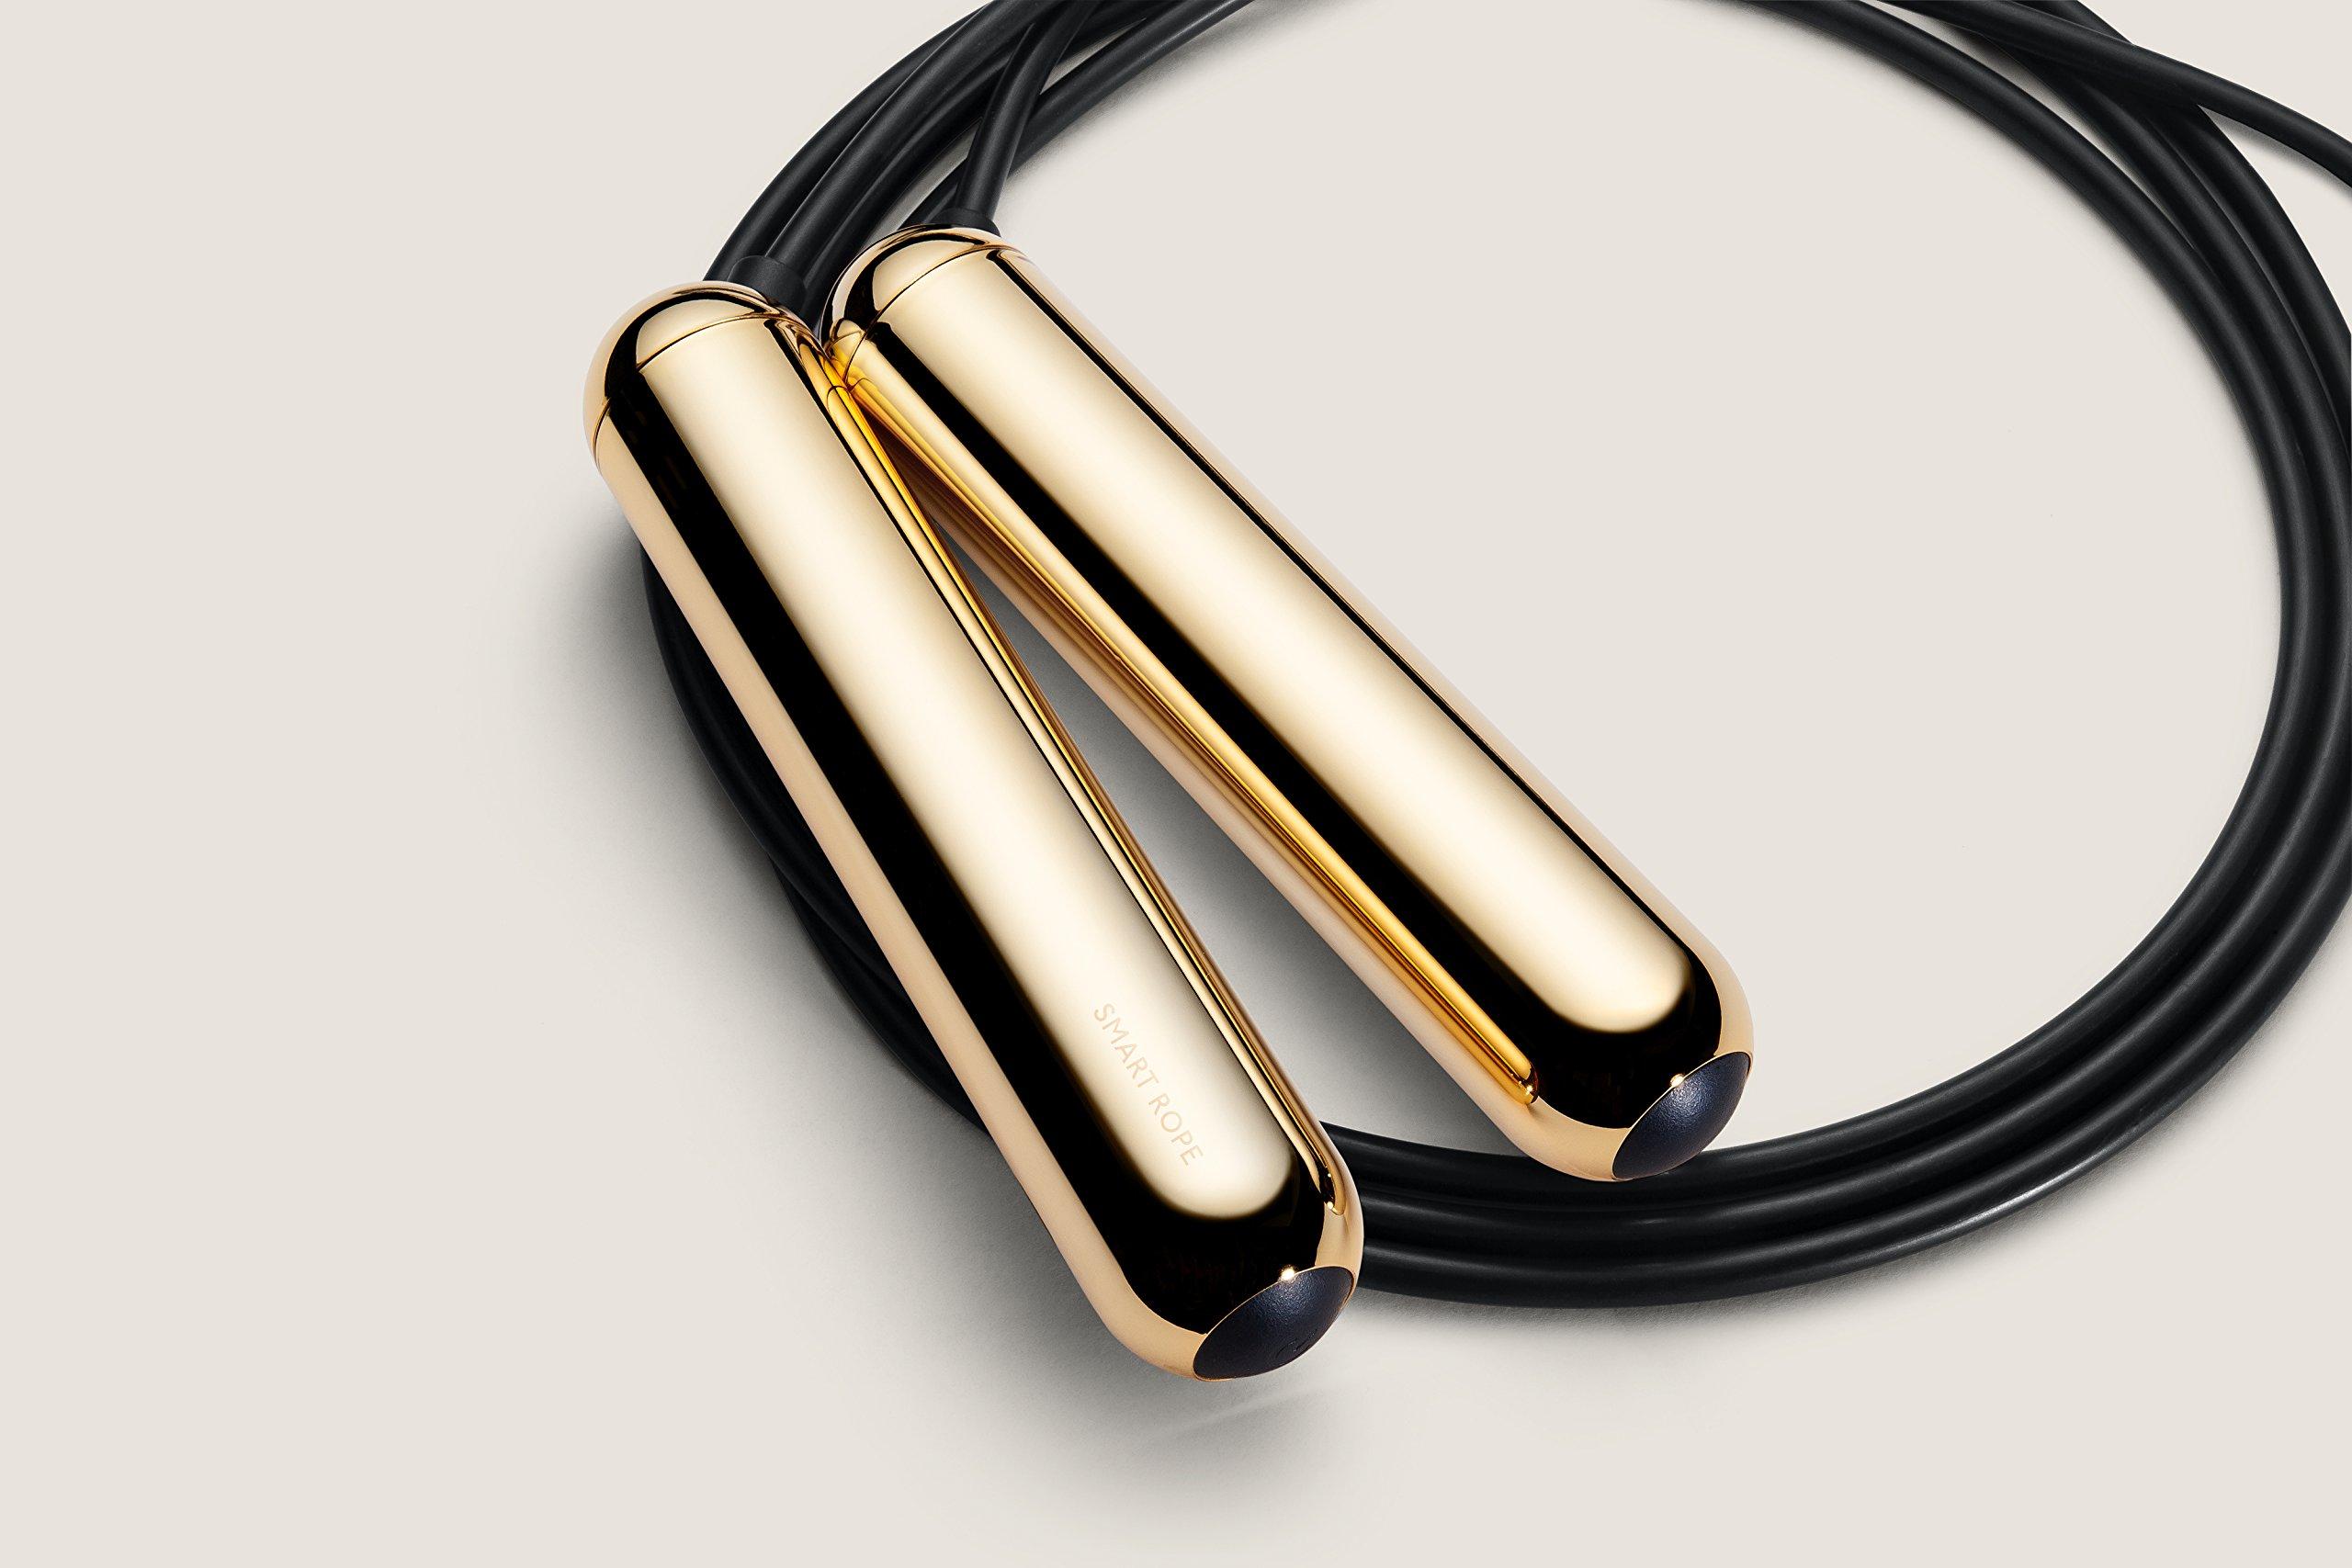 TANGRAM Factory Smart Rope - LED Embedded Jump Rope (Gold, Medium) by TANGRAM (Image #3)